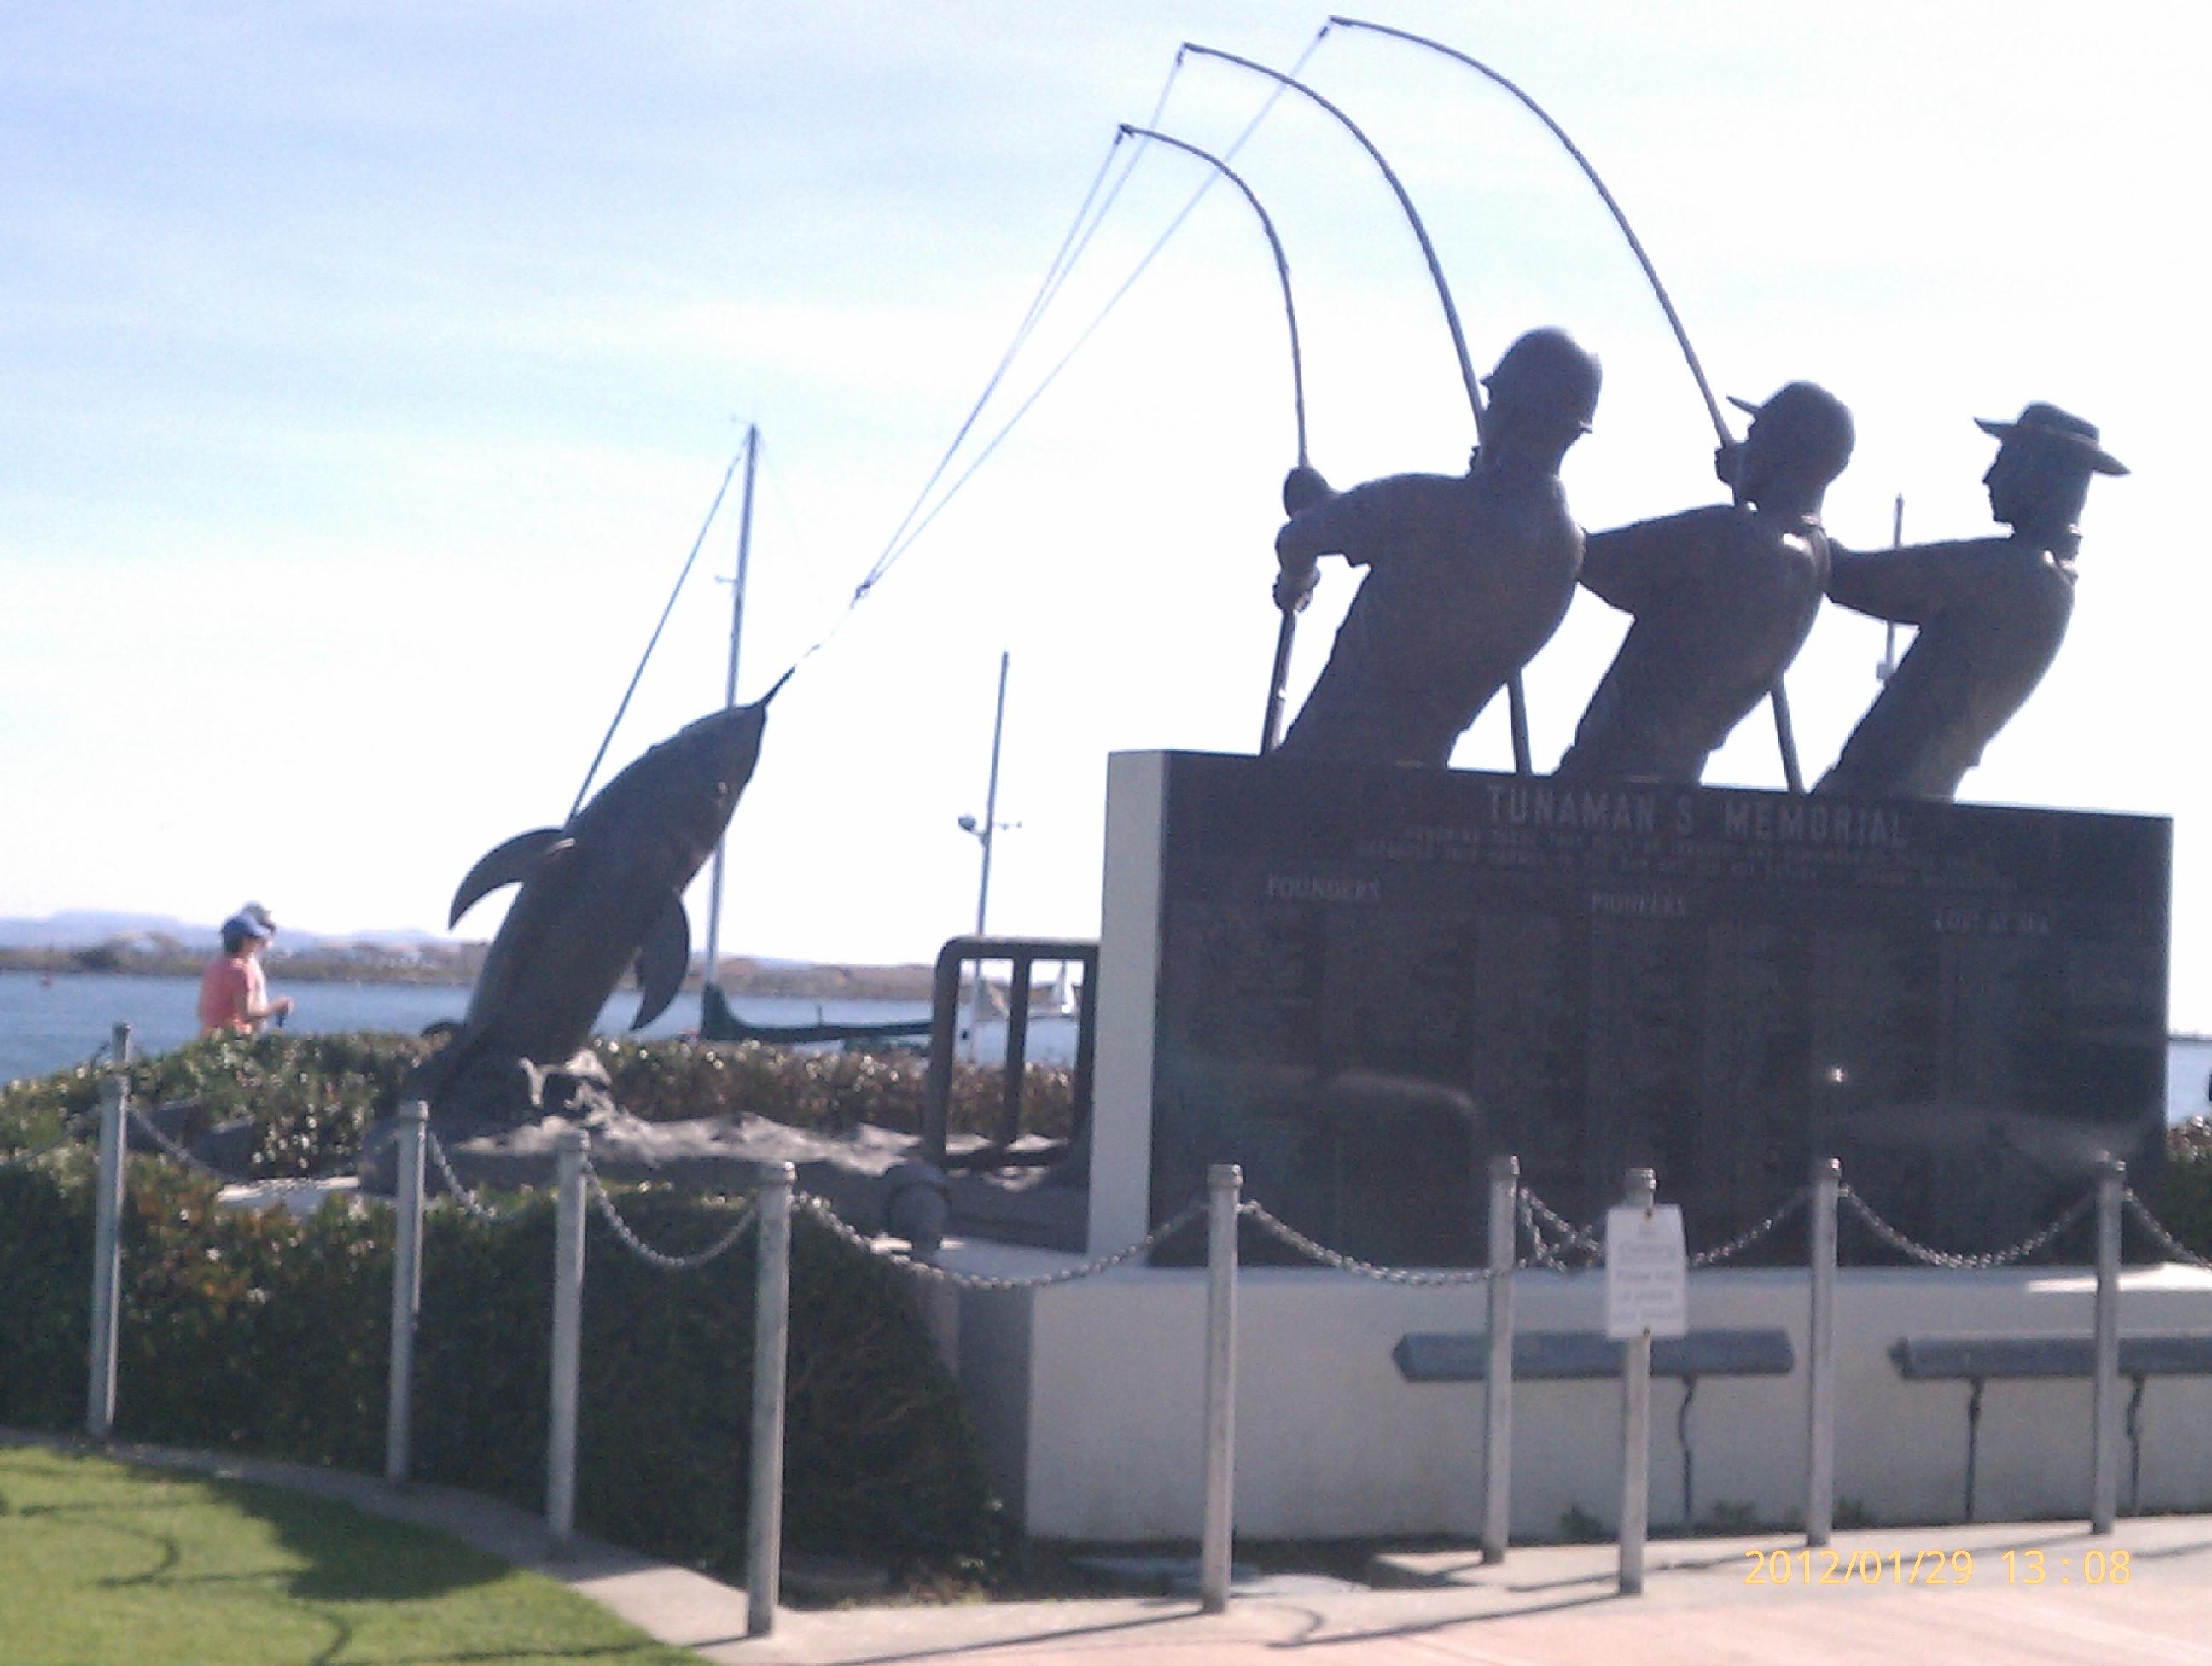 Tunamen's Memorial